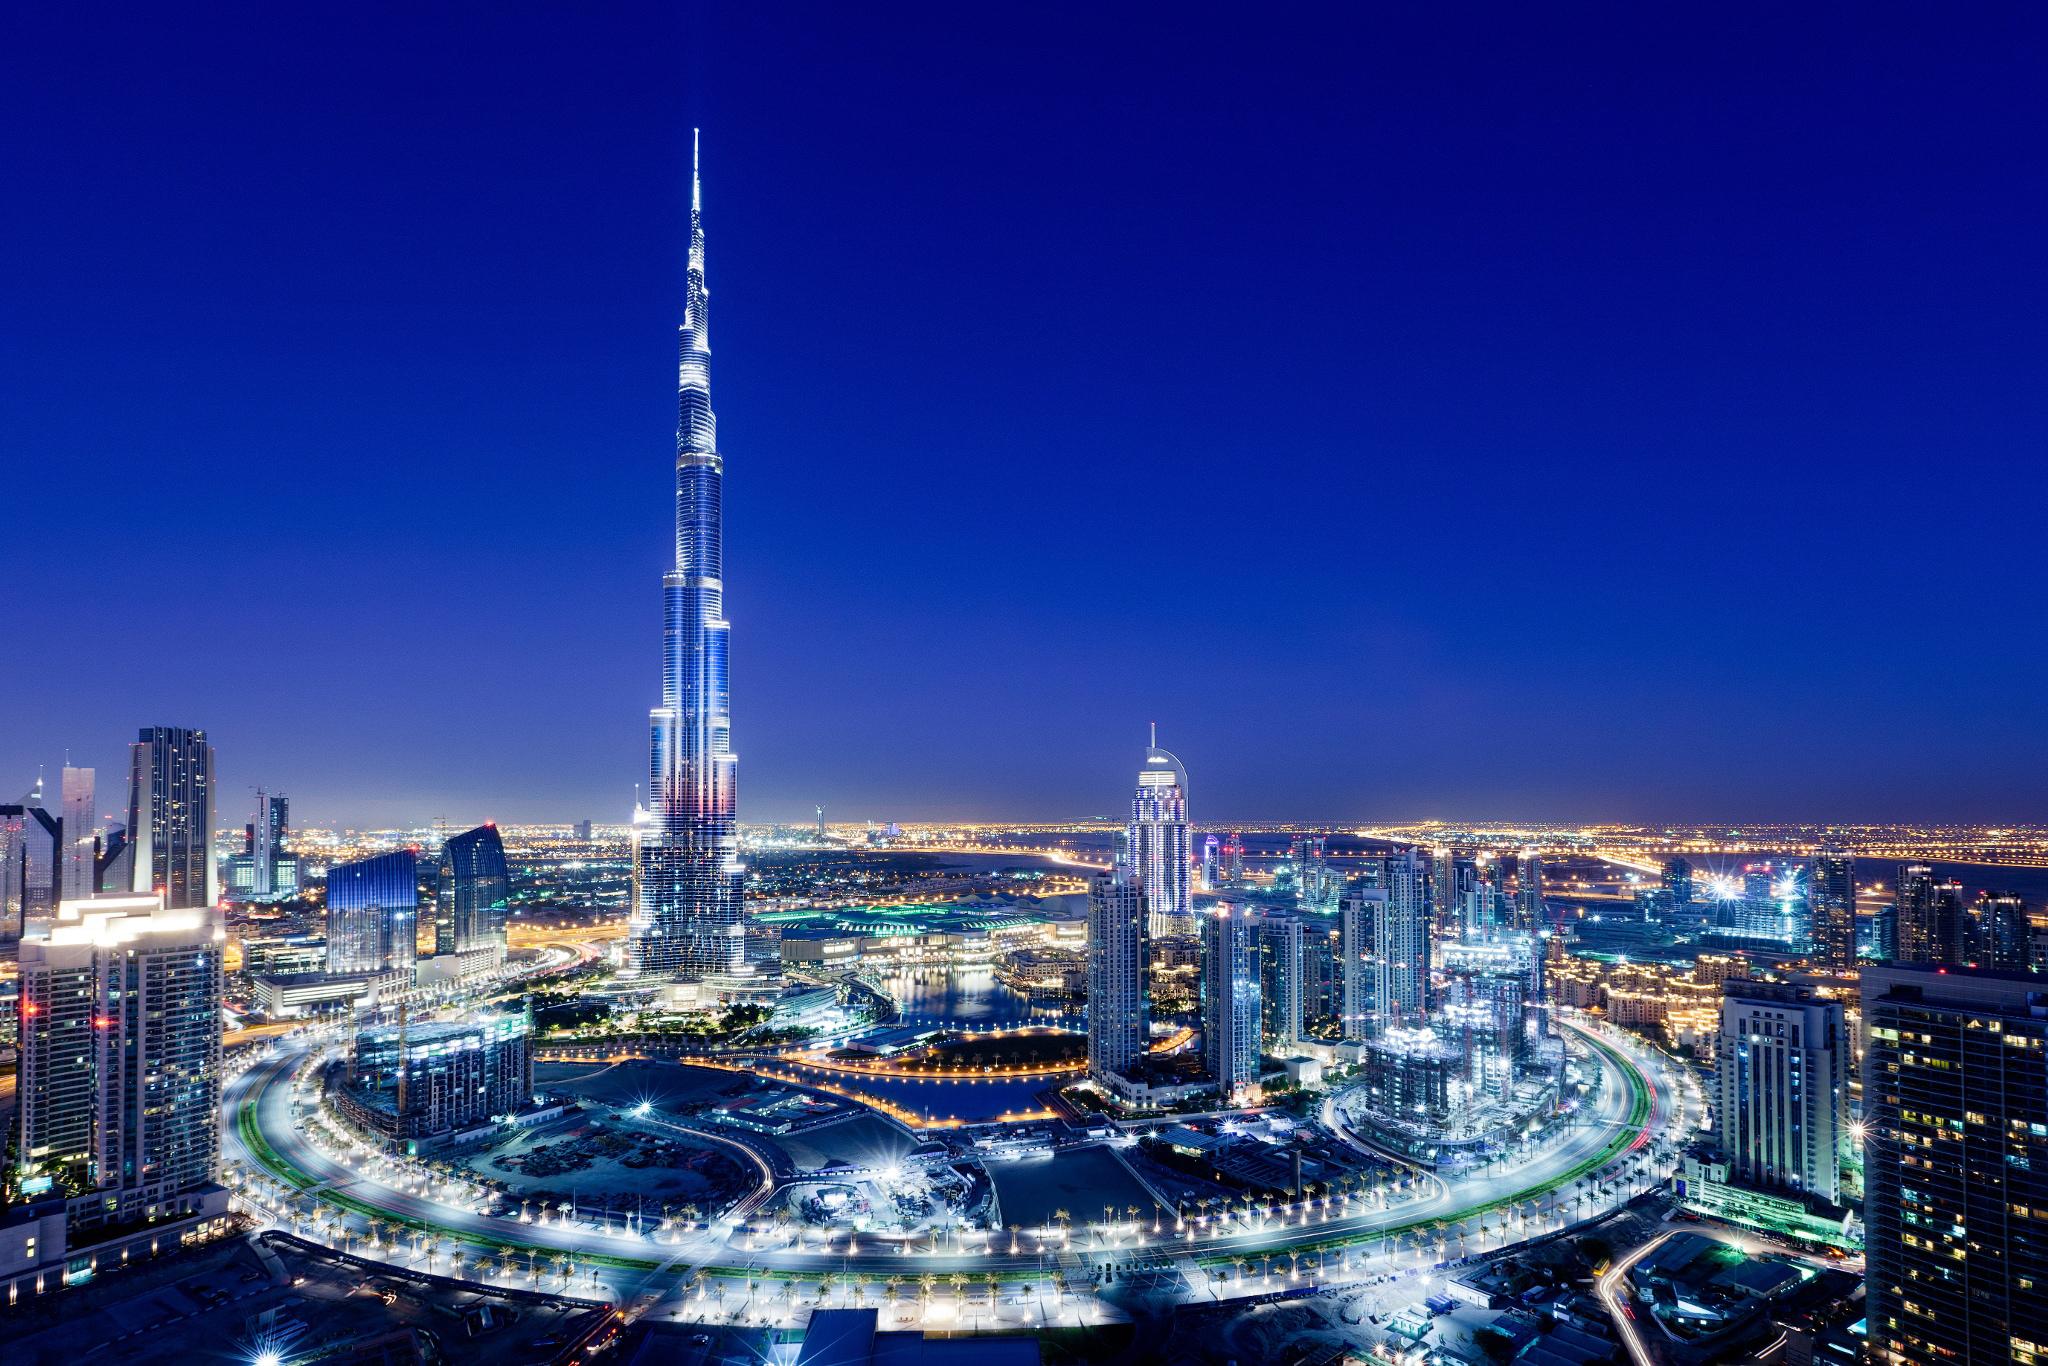 Burj Khalifa Dubai Wallpapers